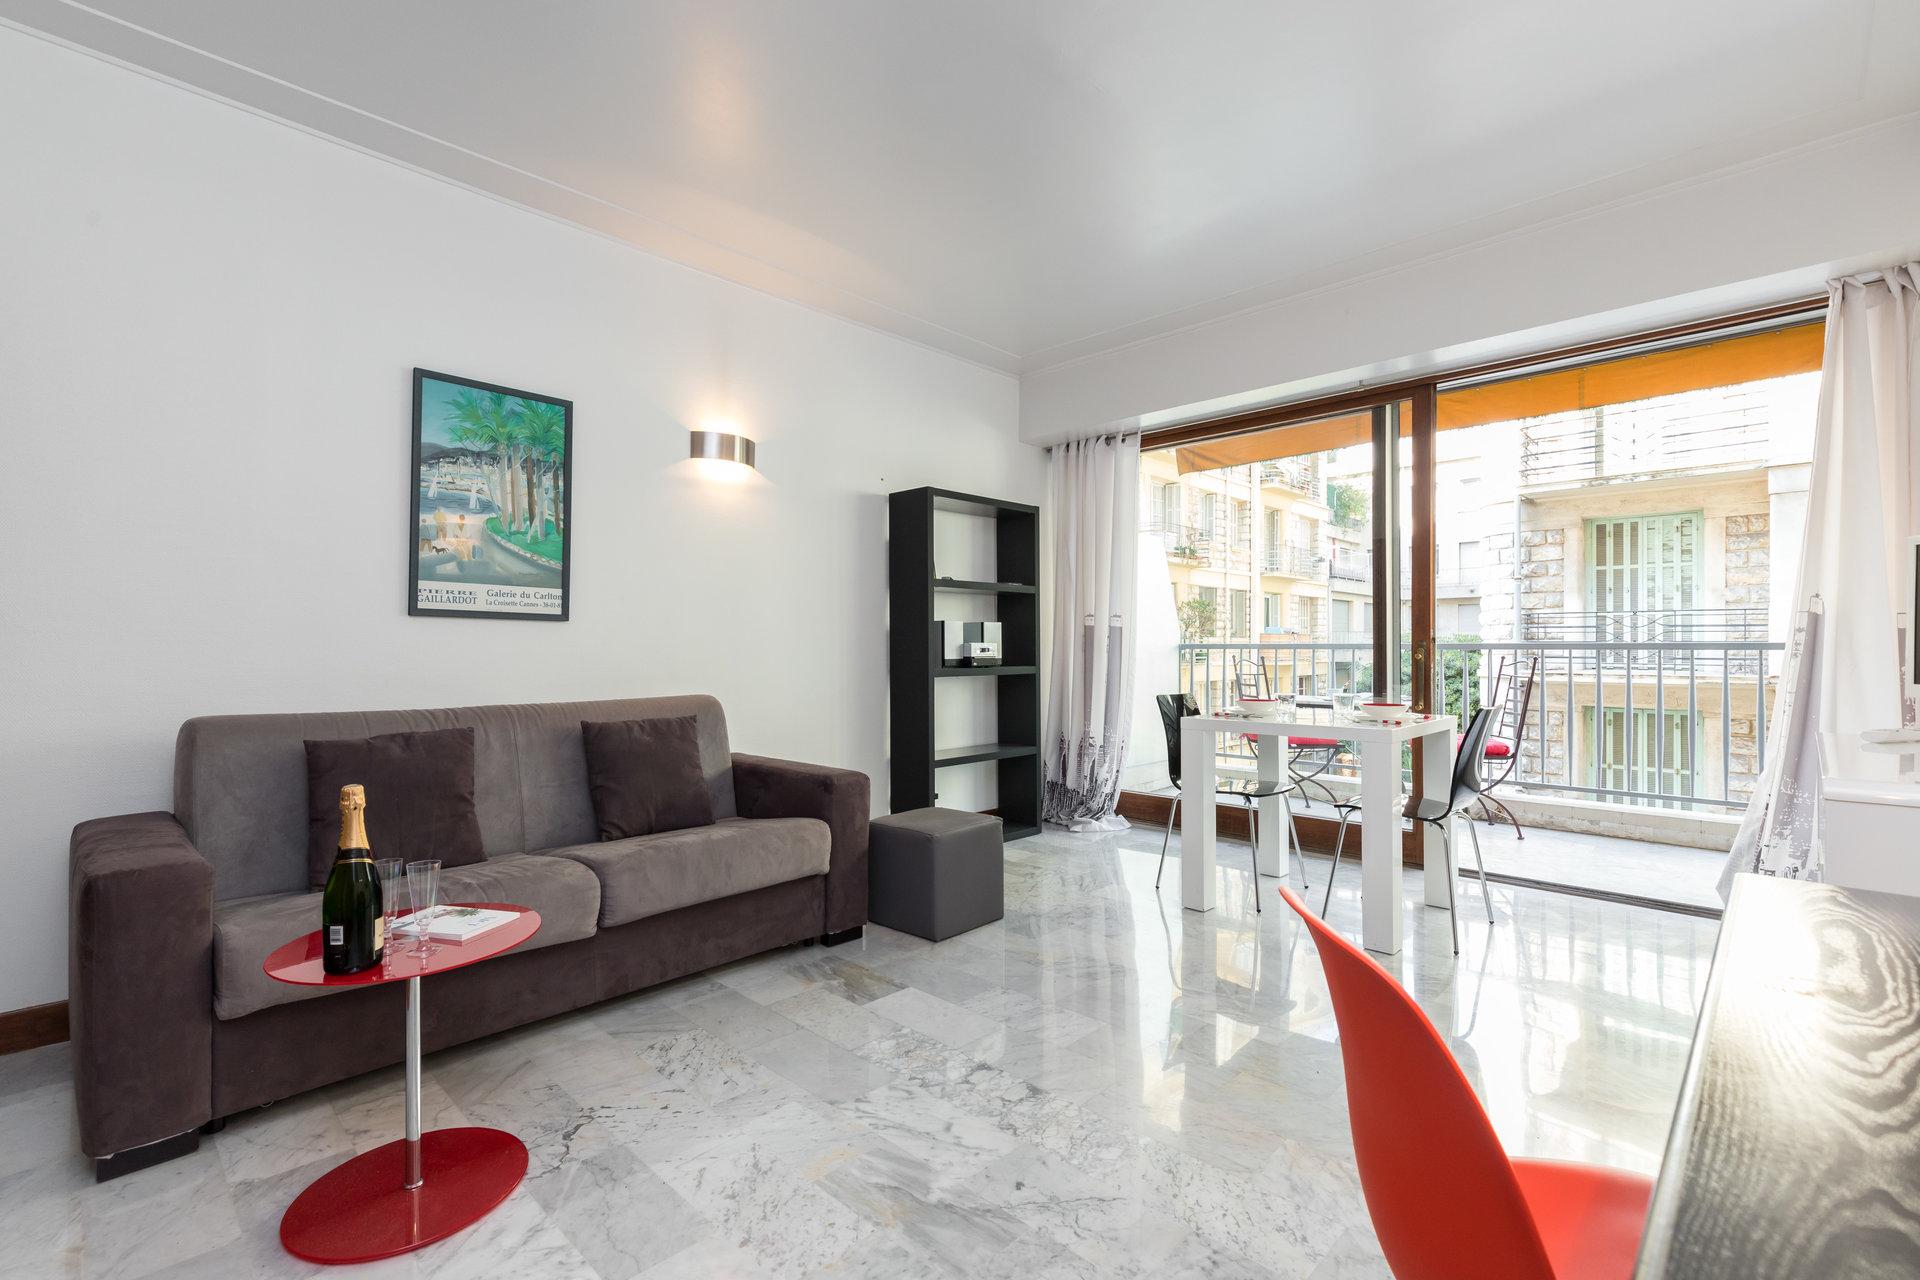 Location meublée longue durée - Coeur de Nice